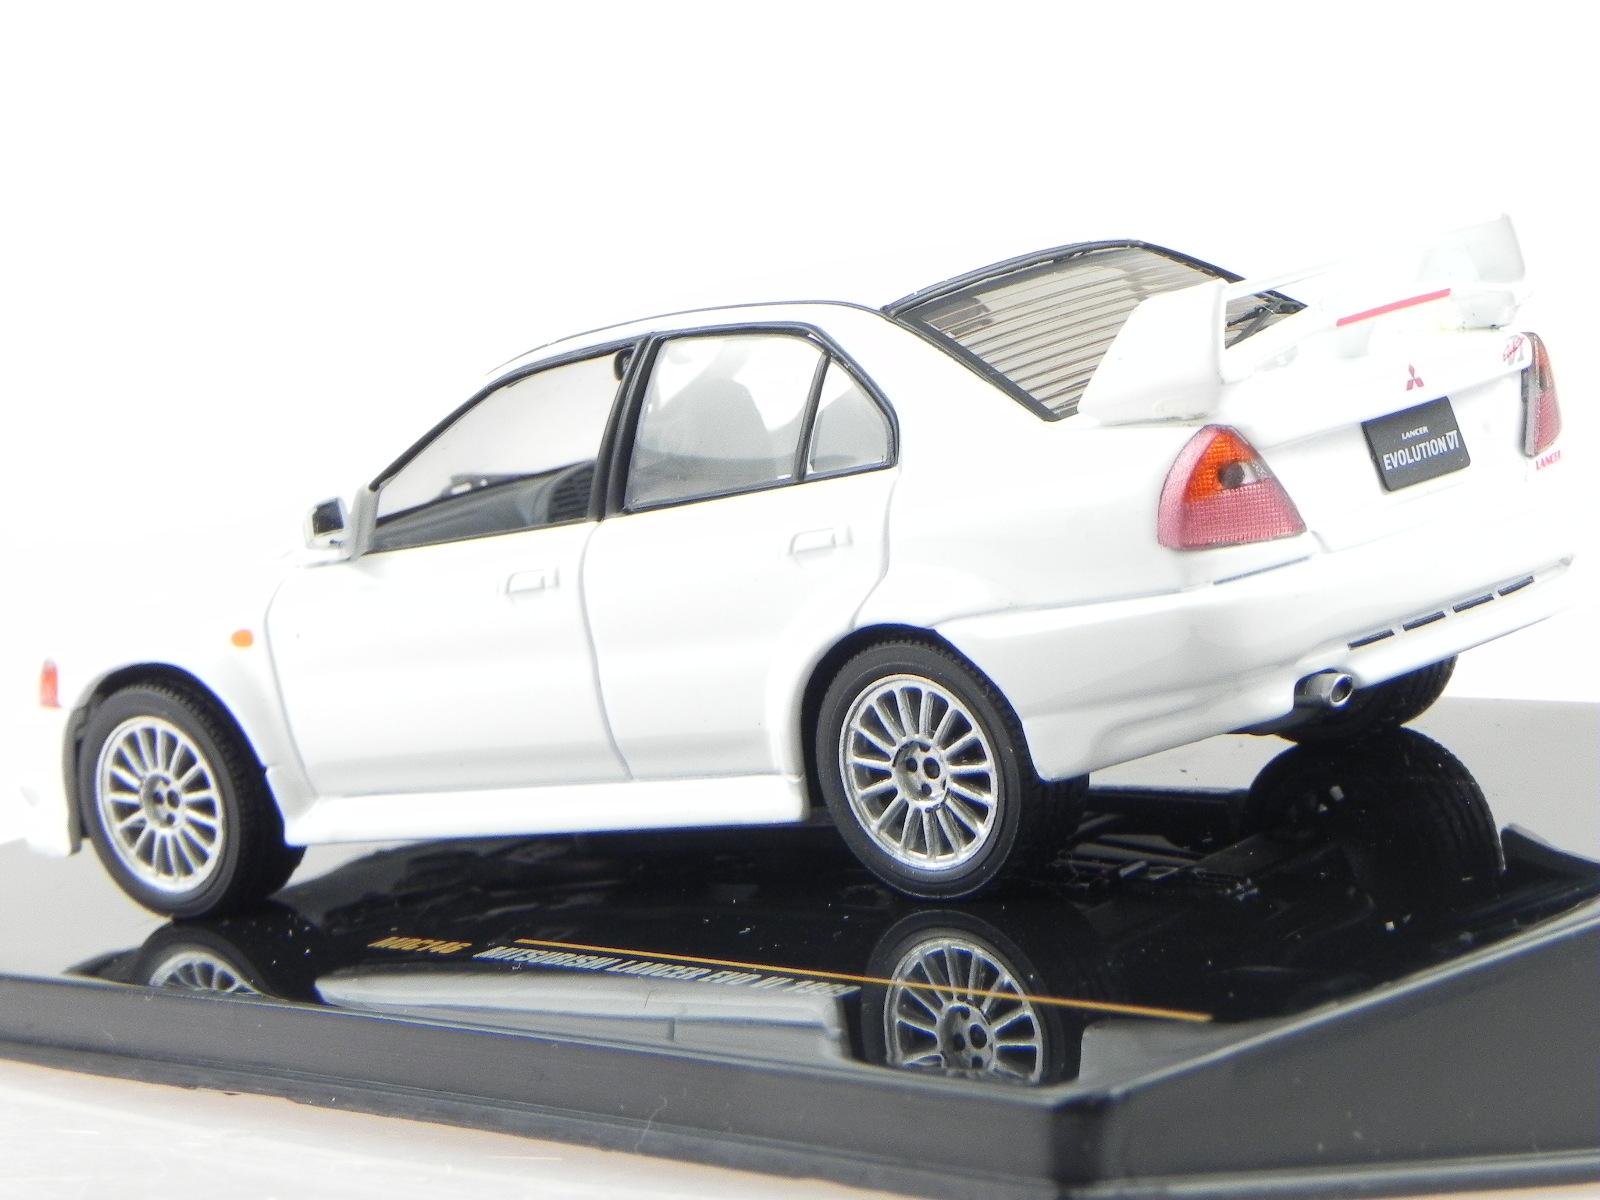 Mitsubishi-Lancer-Evo-11-RS-1999-white-modelcar-MOC146-IXO-1-43